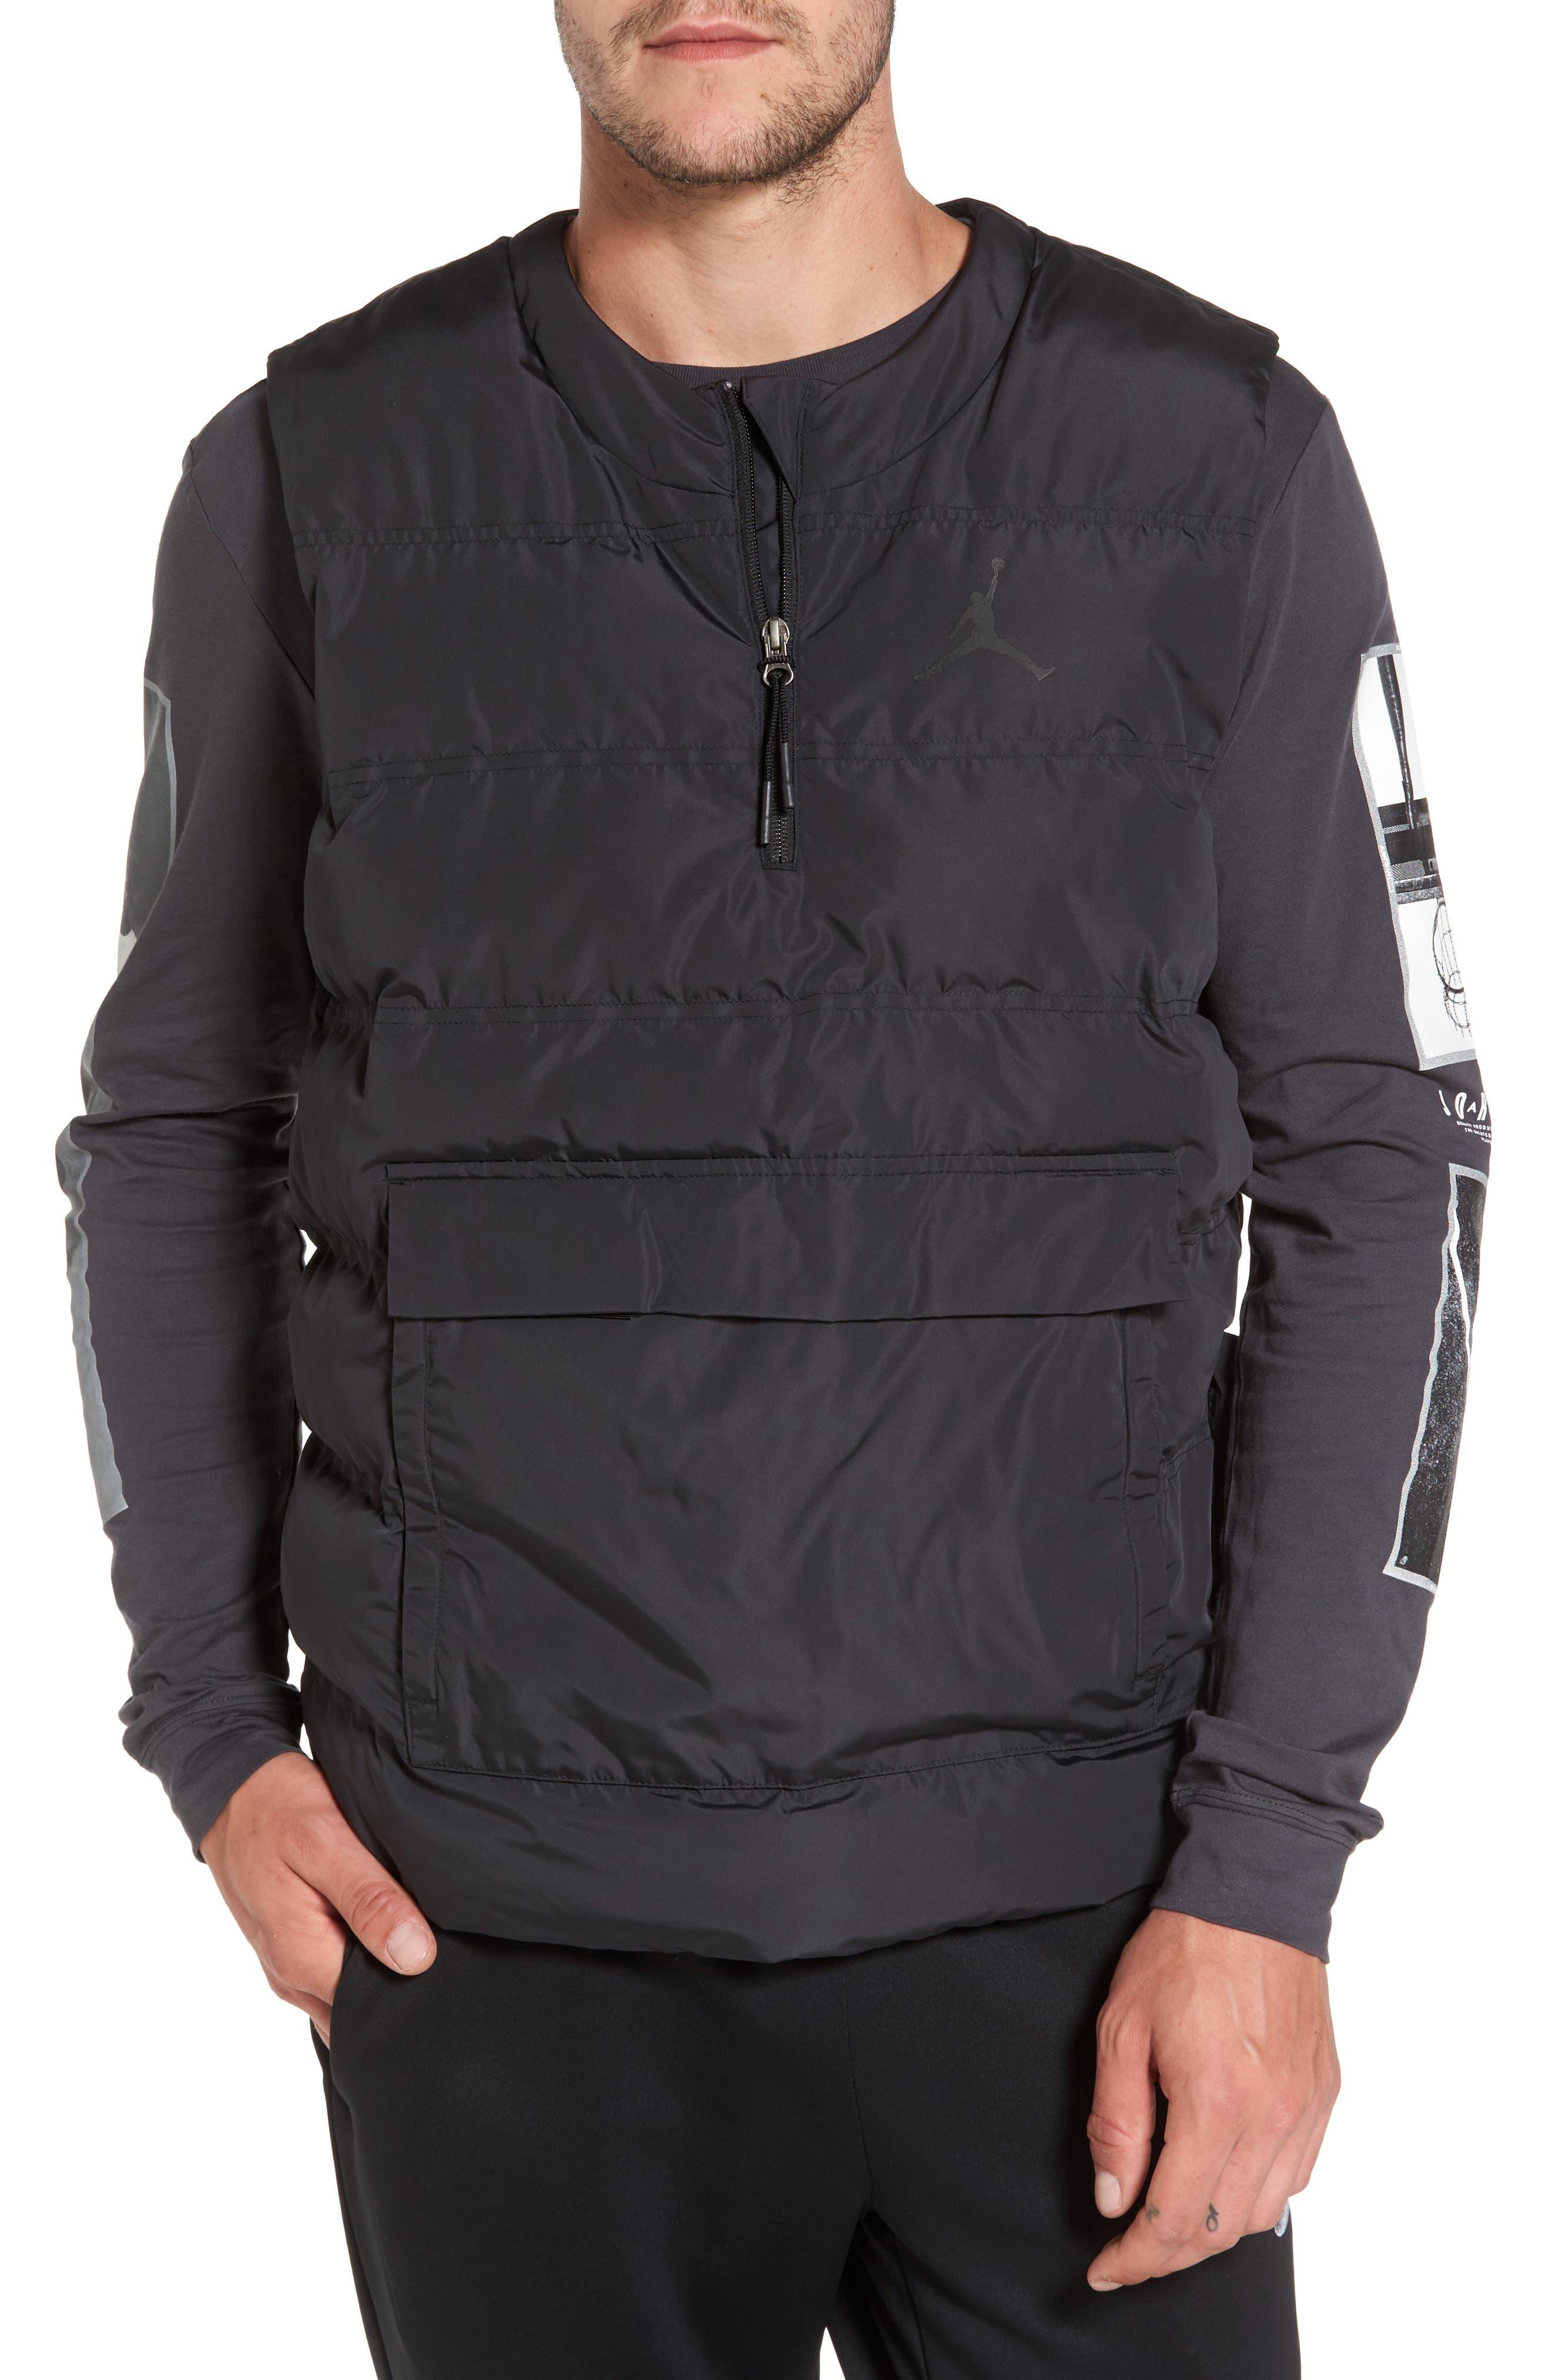 Main Image - Nike Jordan 23 Tech Vest